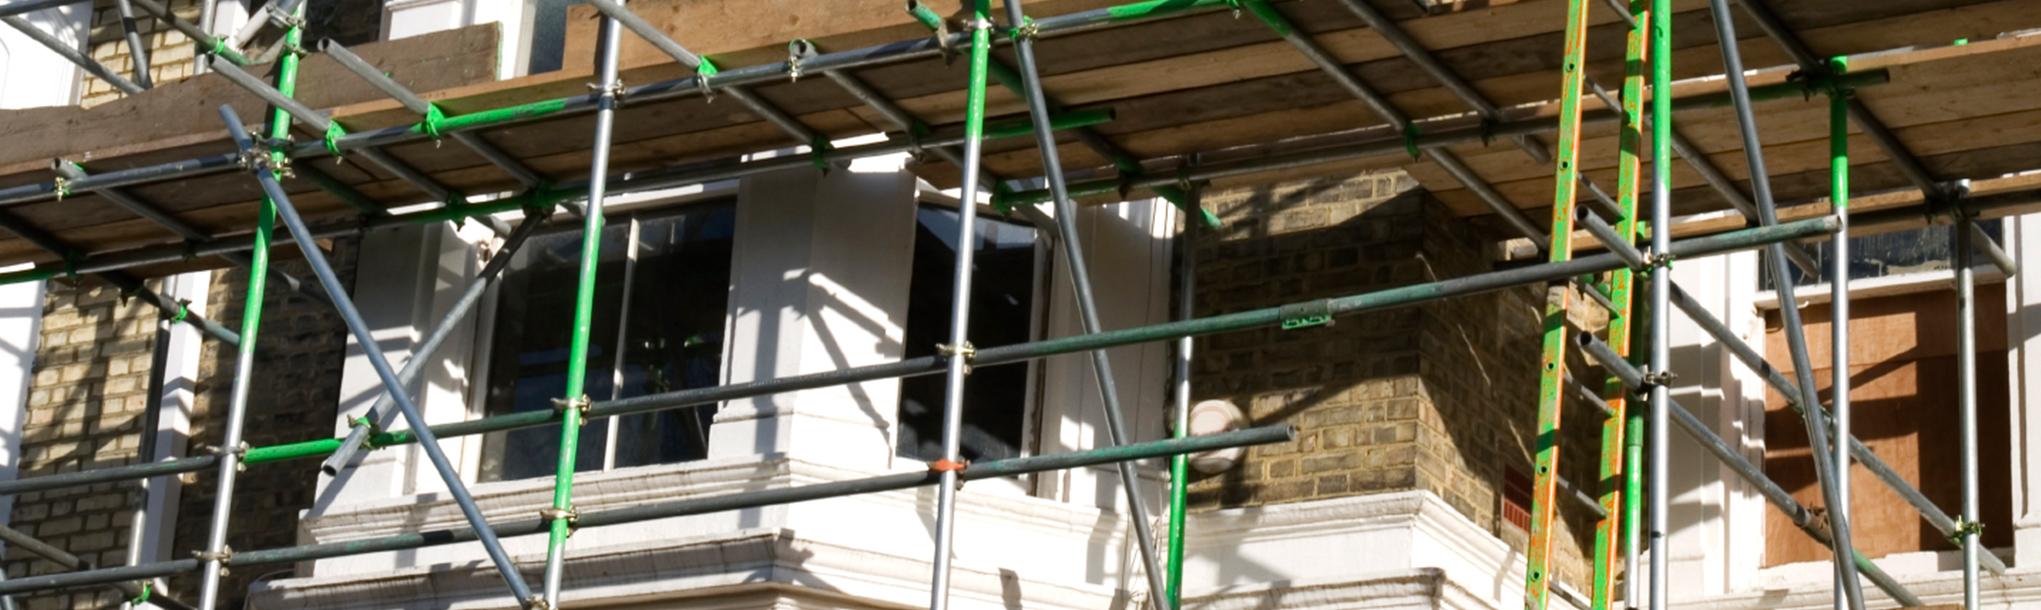 Building Inspection Surveys